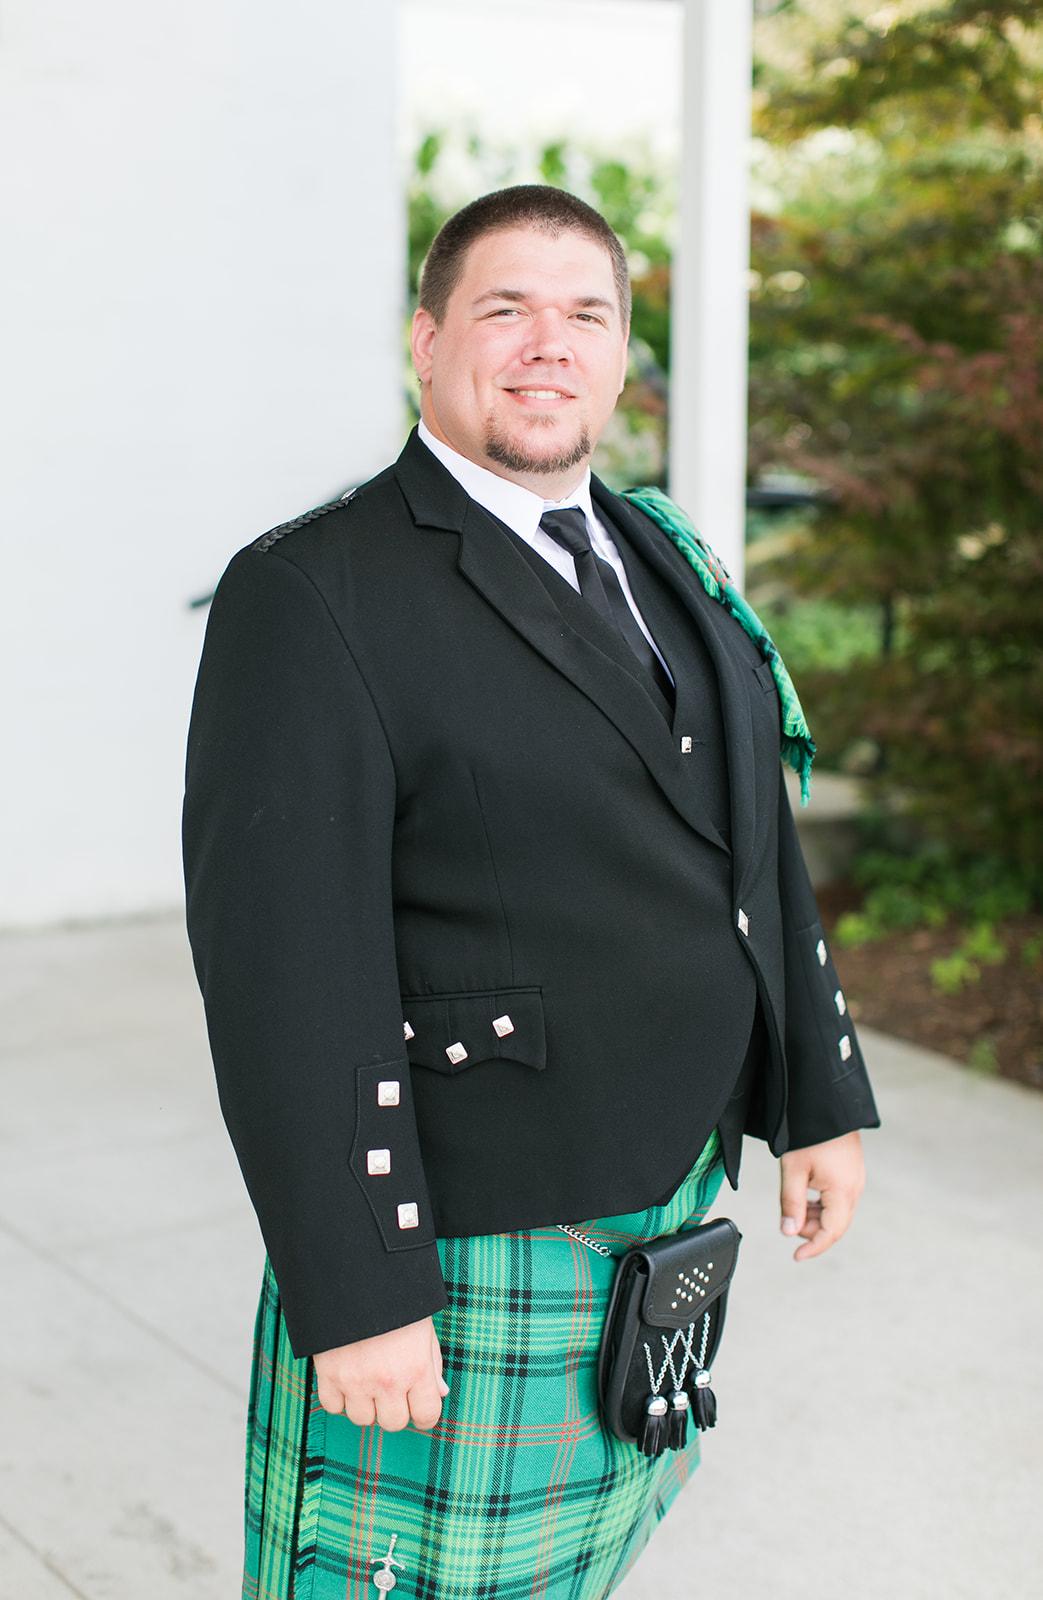 Groom dressed in traditional Scottish kilt